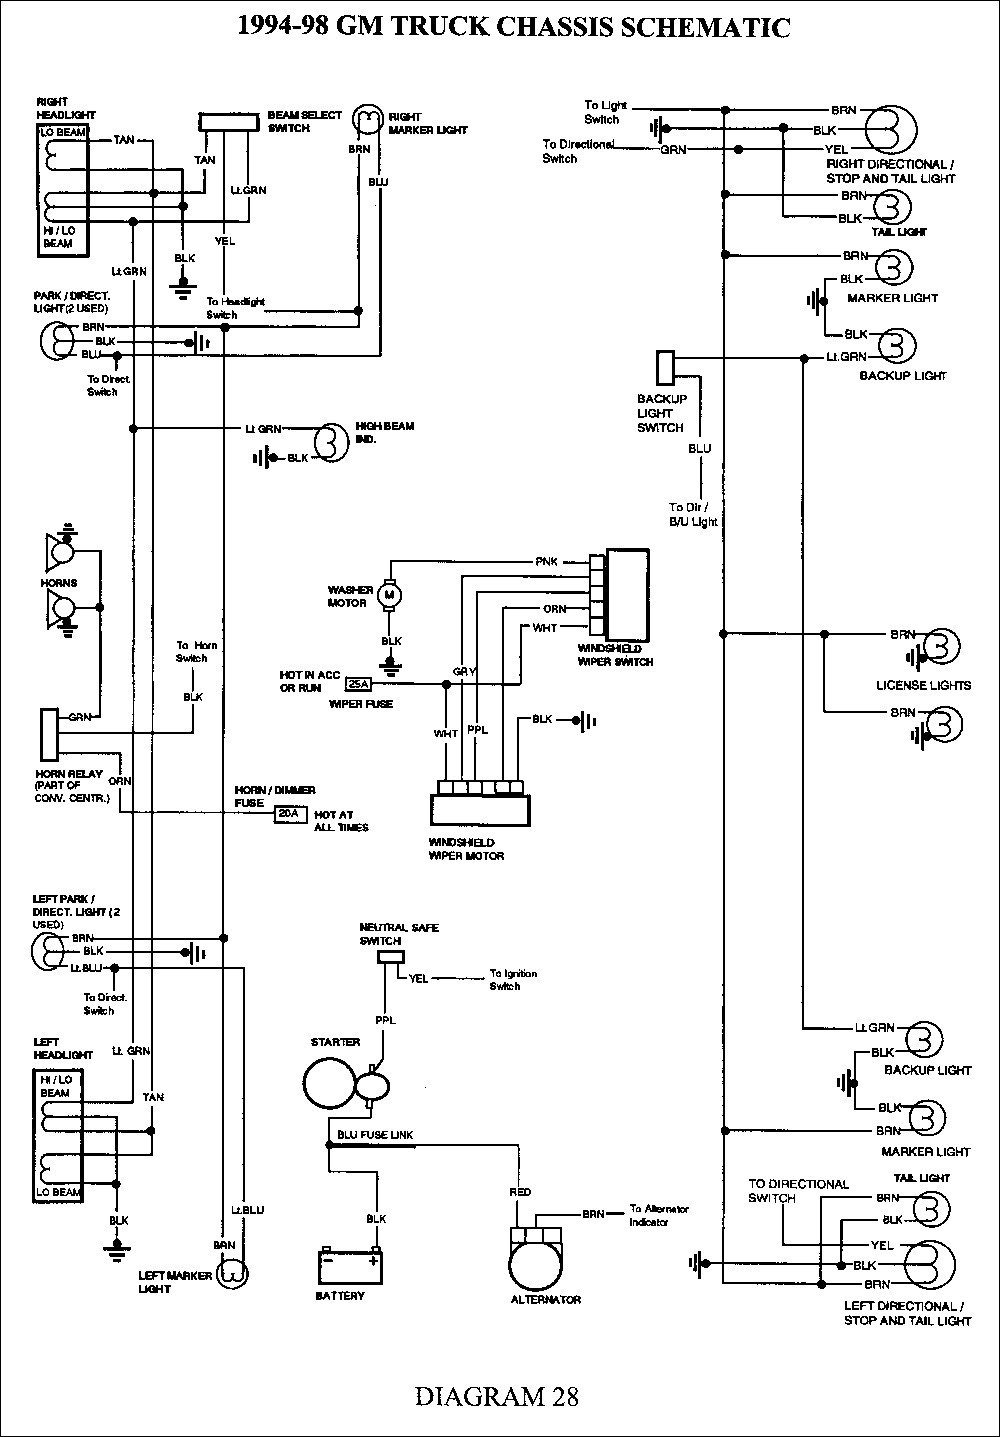 Chevrolet 1500 Trailer Wiring Diagram | Wiring Library